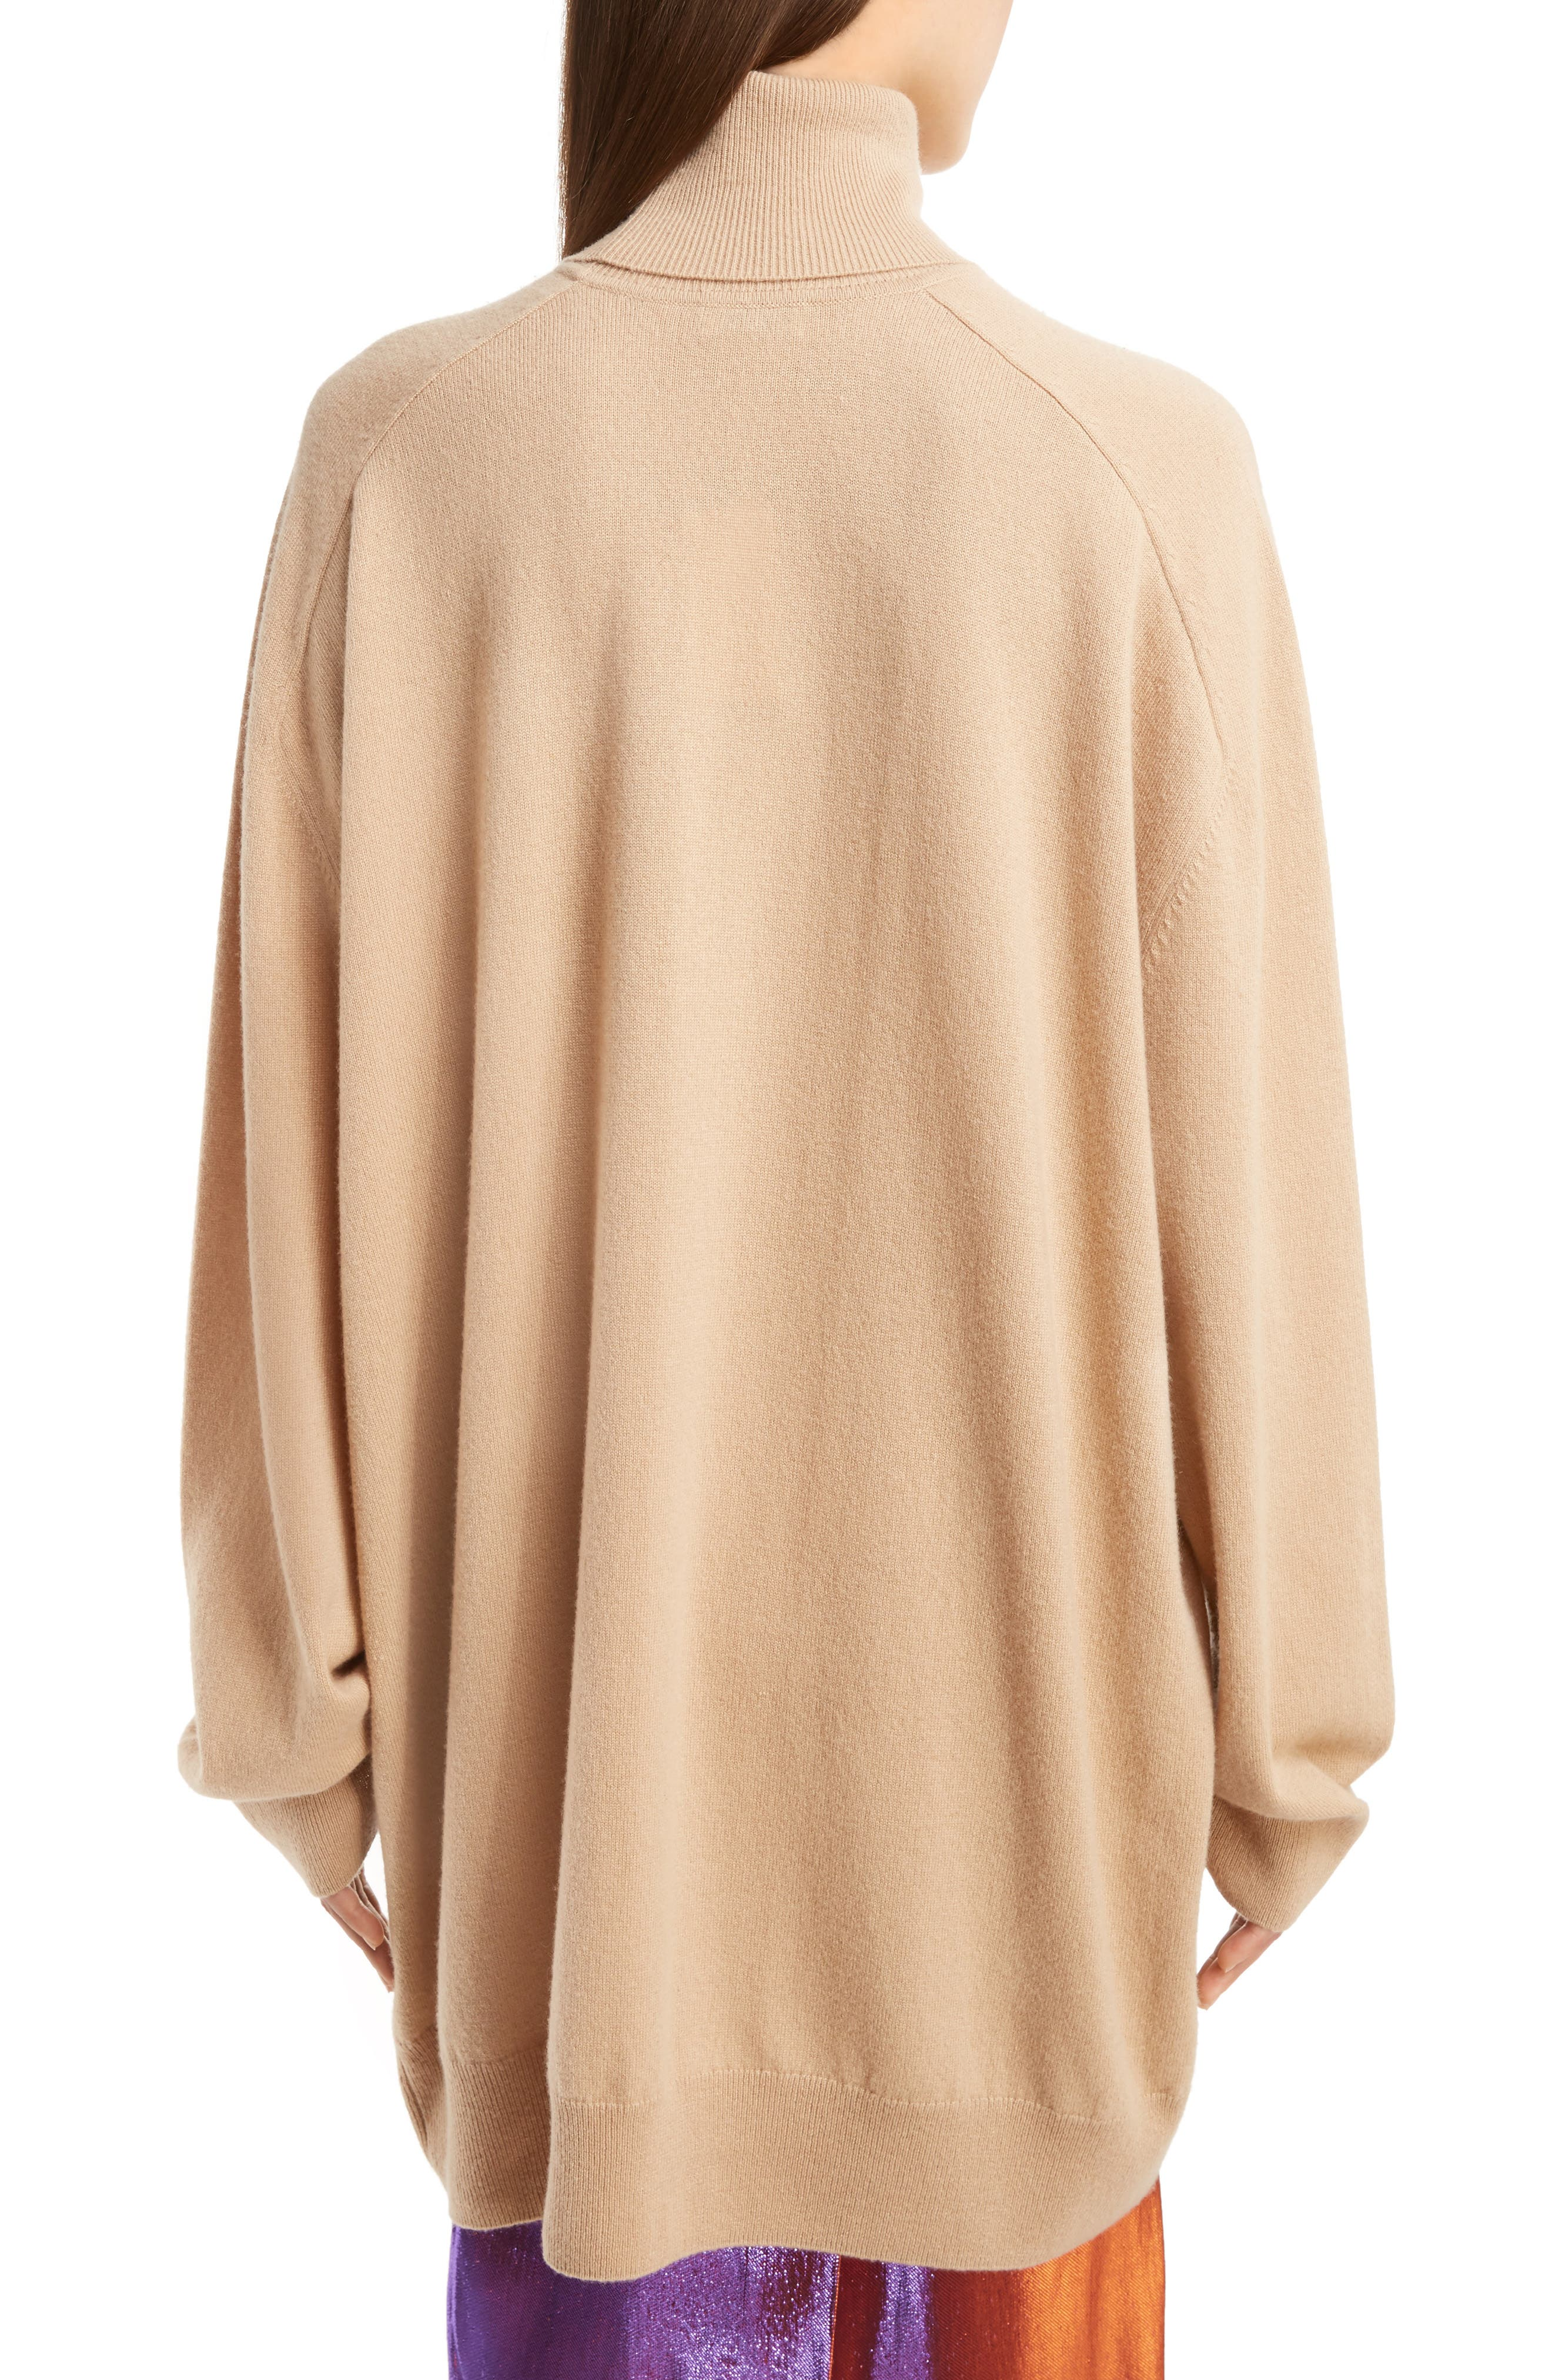 Oversized Cashmere Turtleneck Sweater,                             Alternate thumbnail 2, color,                             Camel